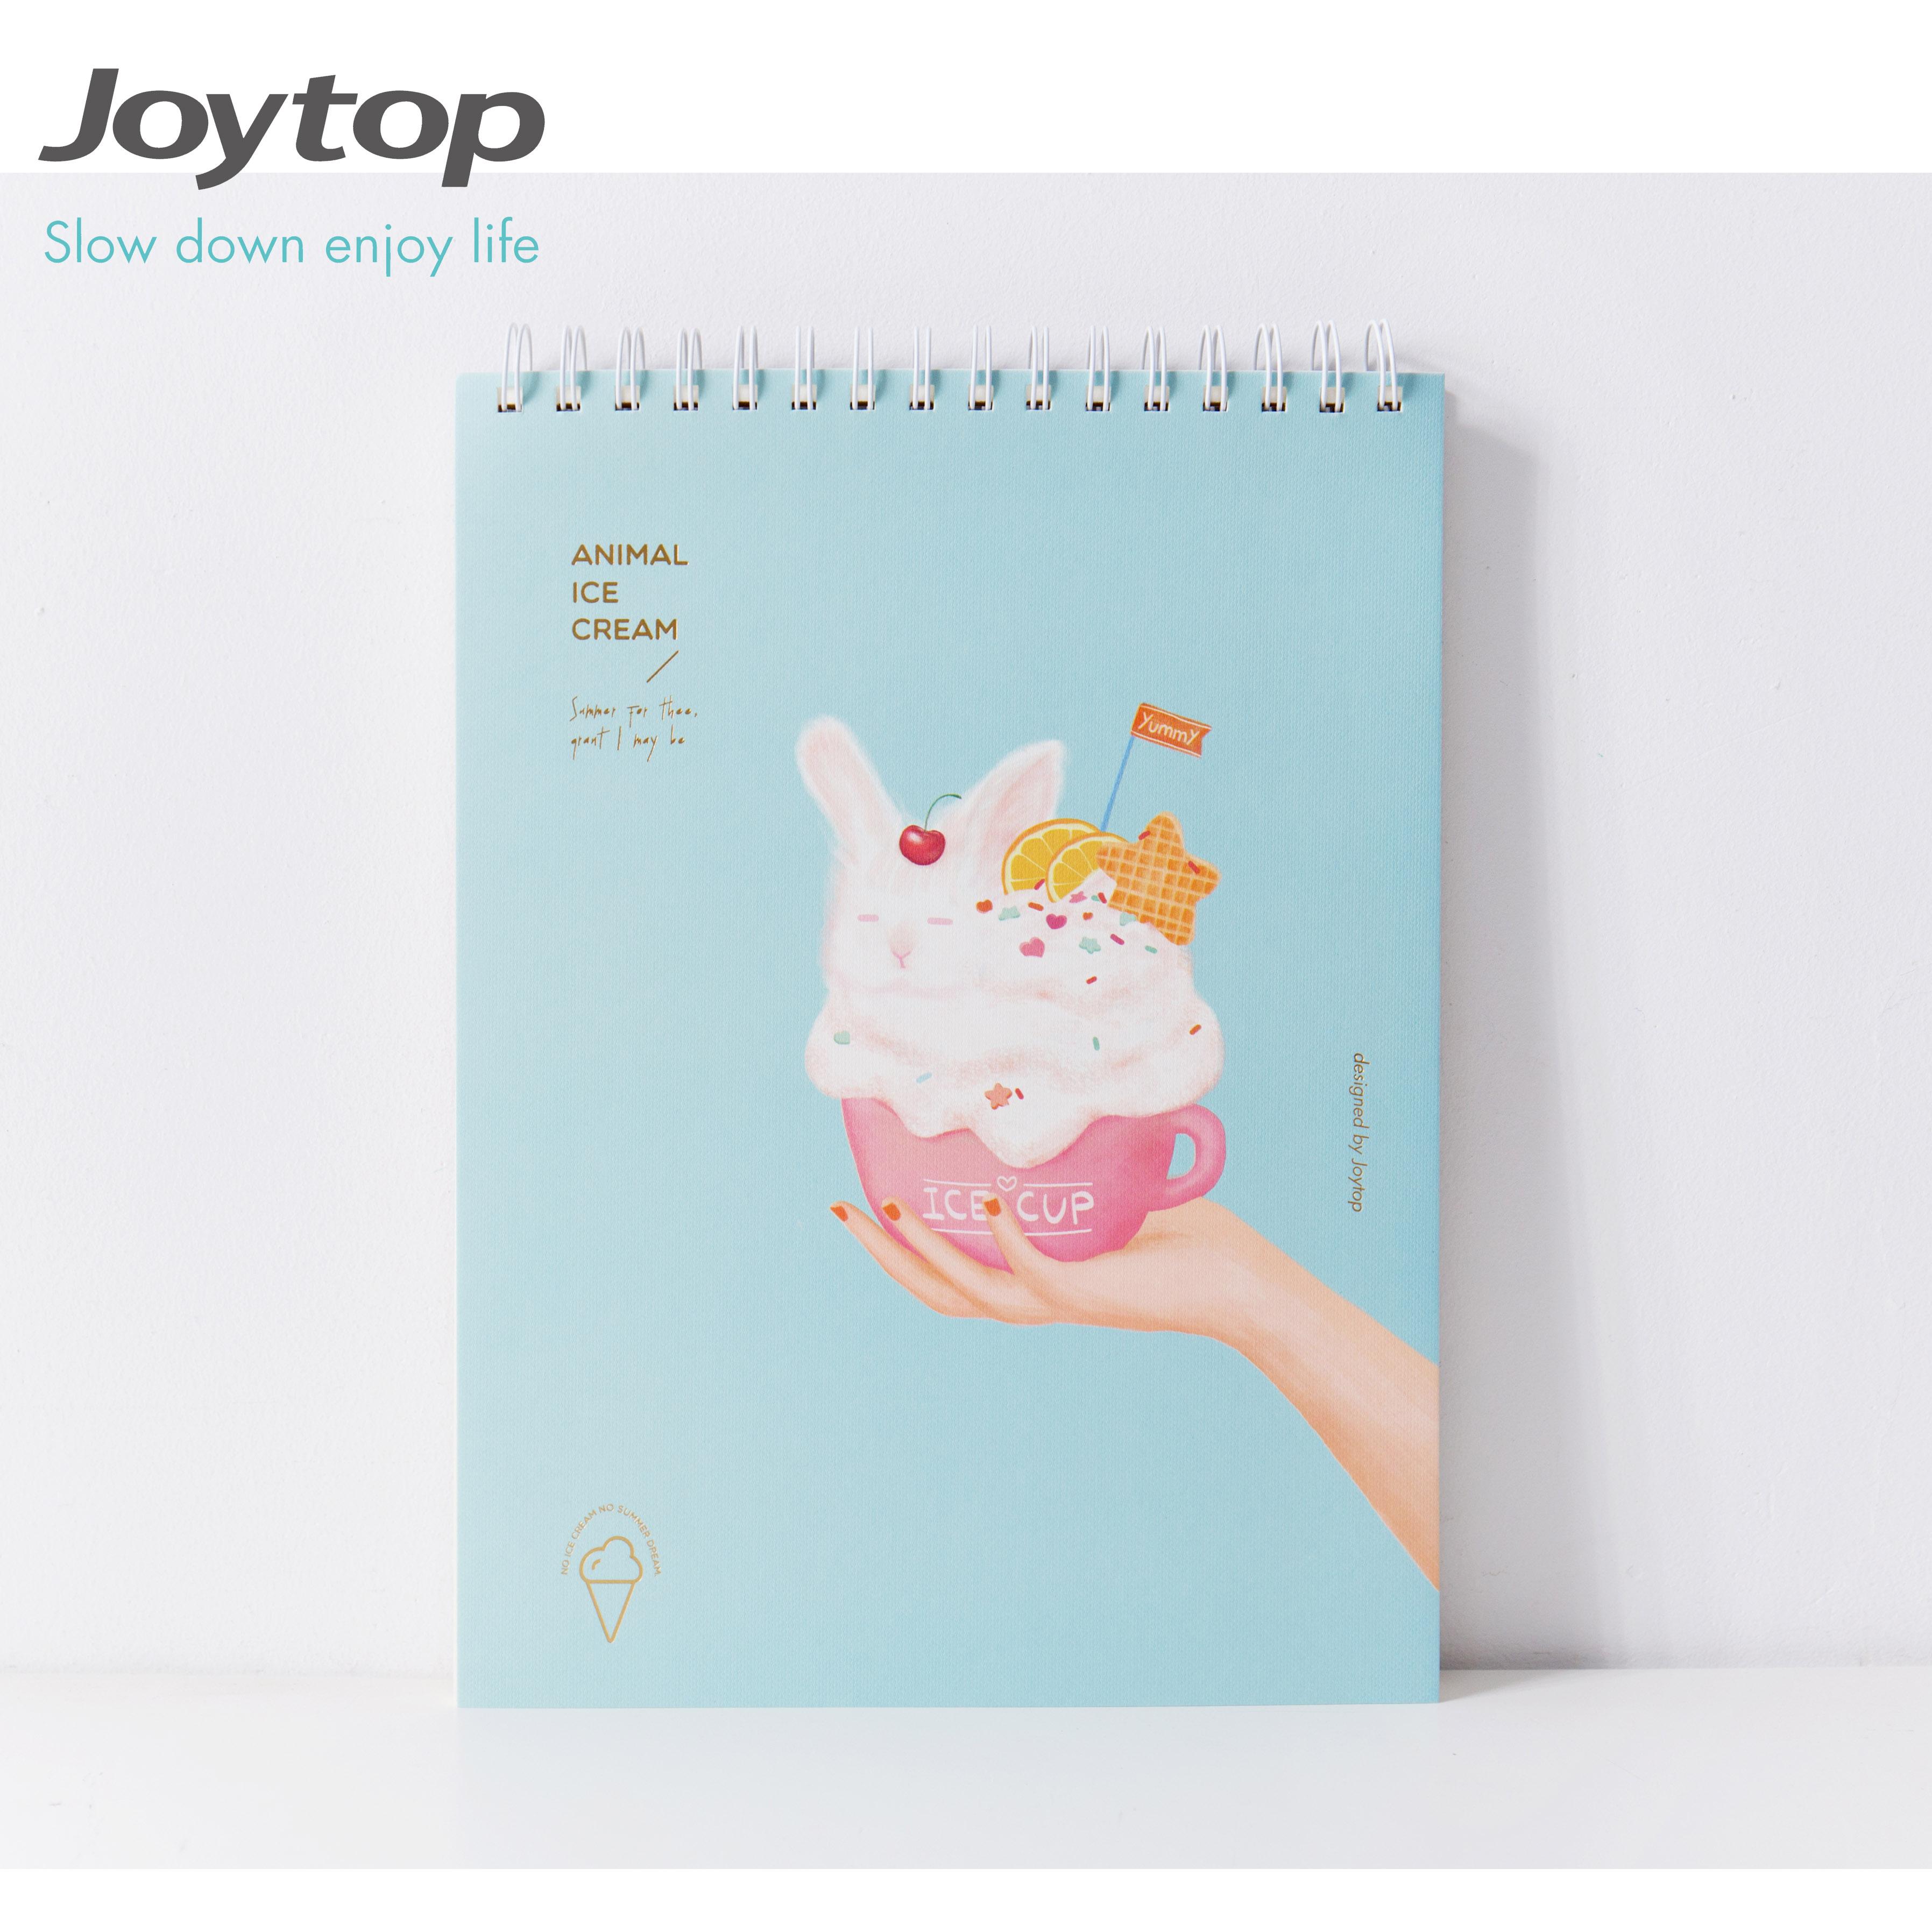 Joytop Hewan Ice Cream Buku Sketsa B5 Buku Gambar 7961 Buy Buku Gambar Buku Gambar Buku Foto Product On Alibaba